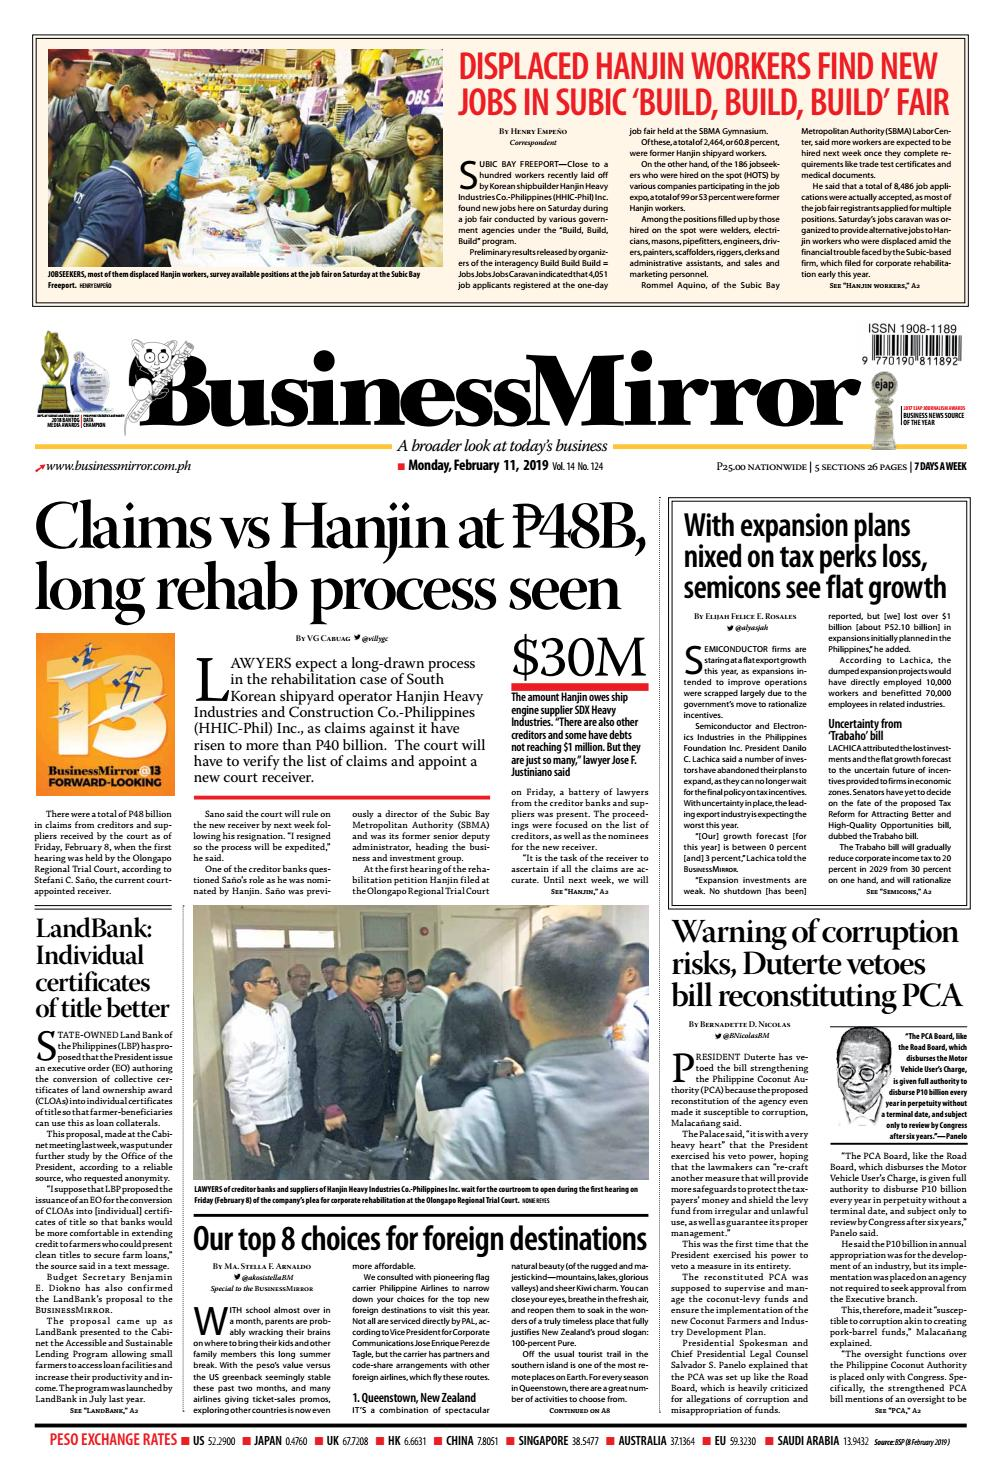 BusinessMirror February 11, 2019 by BusinessMirror - issuu